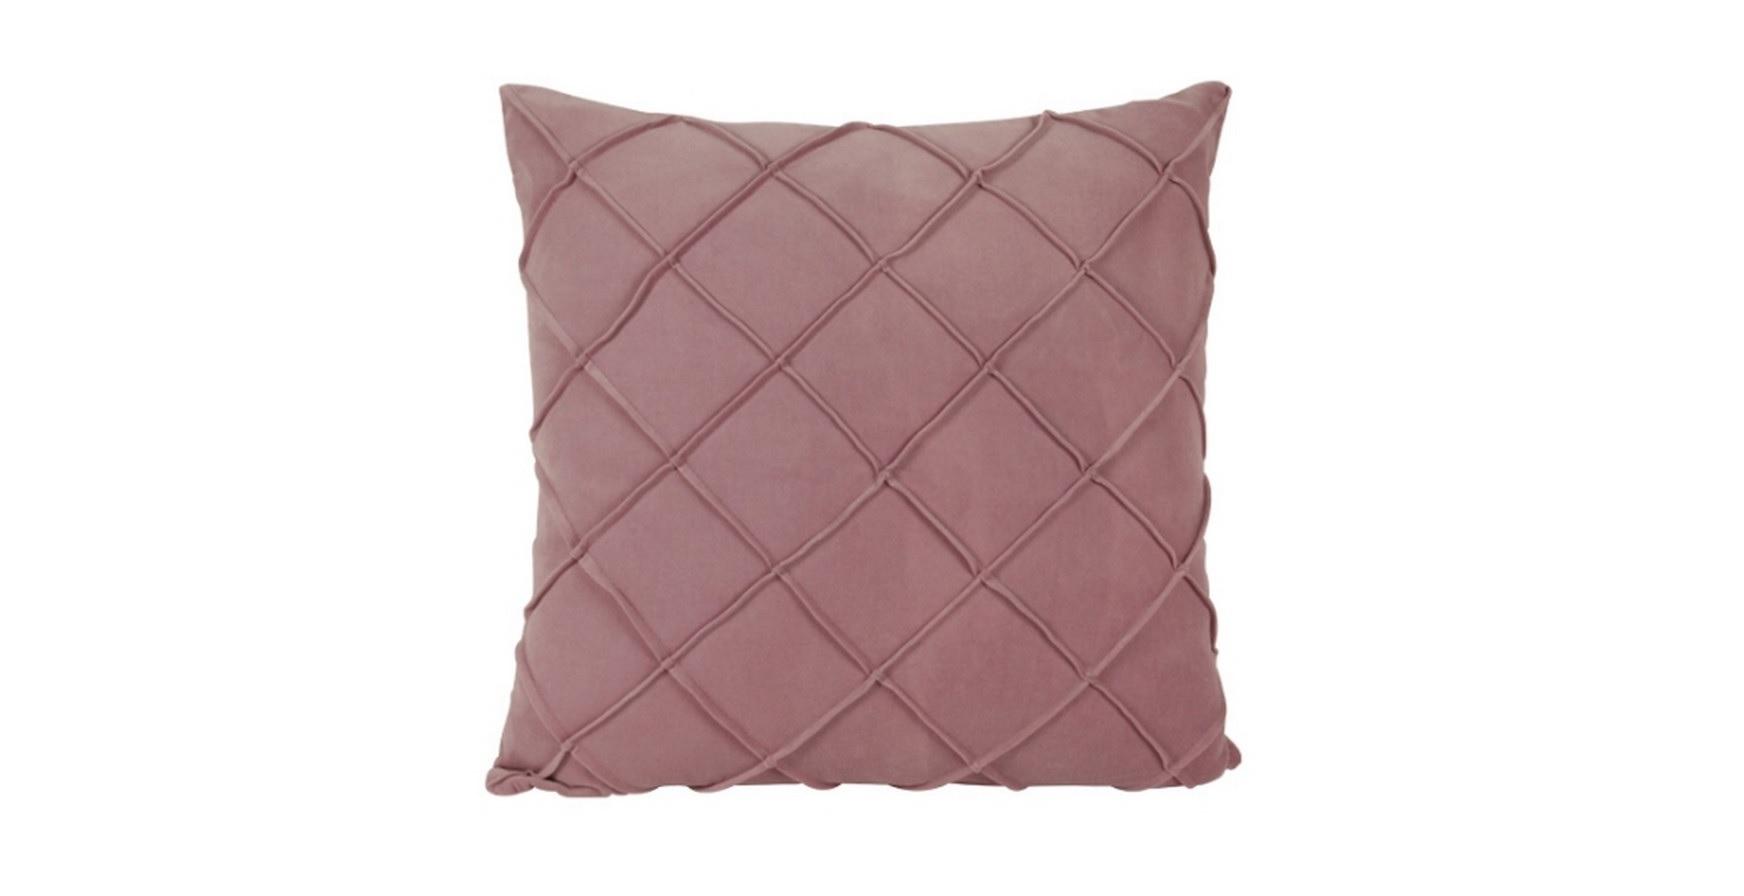 Чехол на подушкуКвадратные подушки<br>Чехол на подушку розового цвета от датского бренда g&amp;amp;c.<br><br>Material: Текстиль<br>Length см: None<br>Width см: 45<br>Depth см: 10<br>Height см: 45<br>Diameter см: None